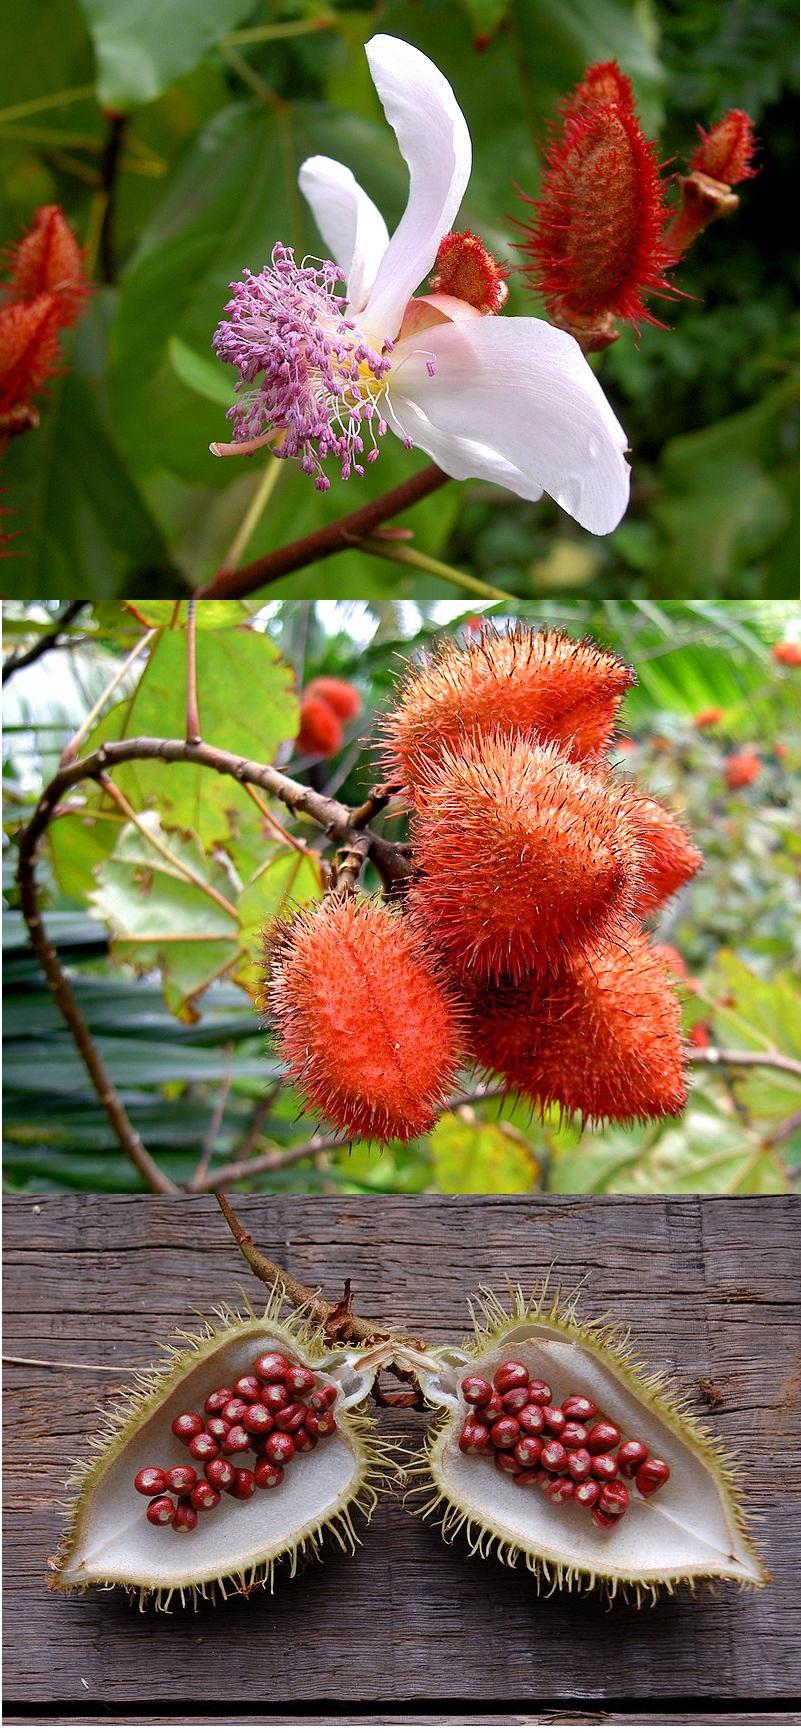 Roucou Bixia_orellana trio fleur-fruits-graines